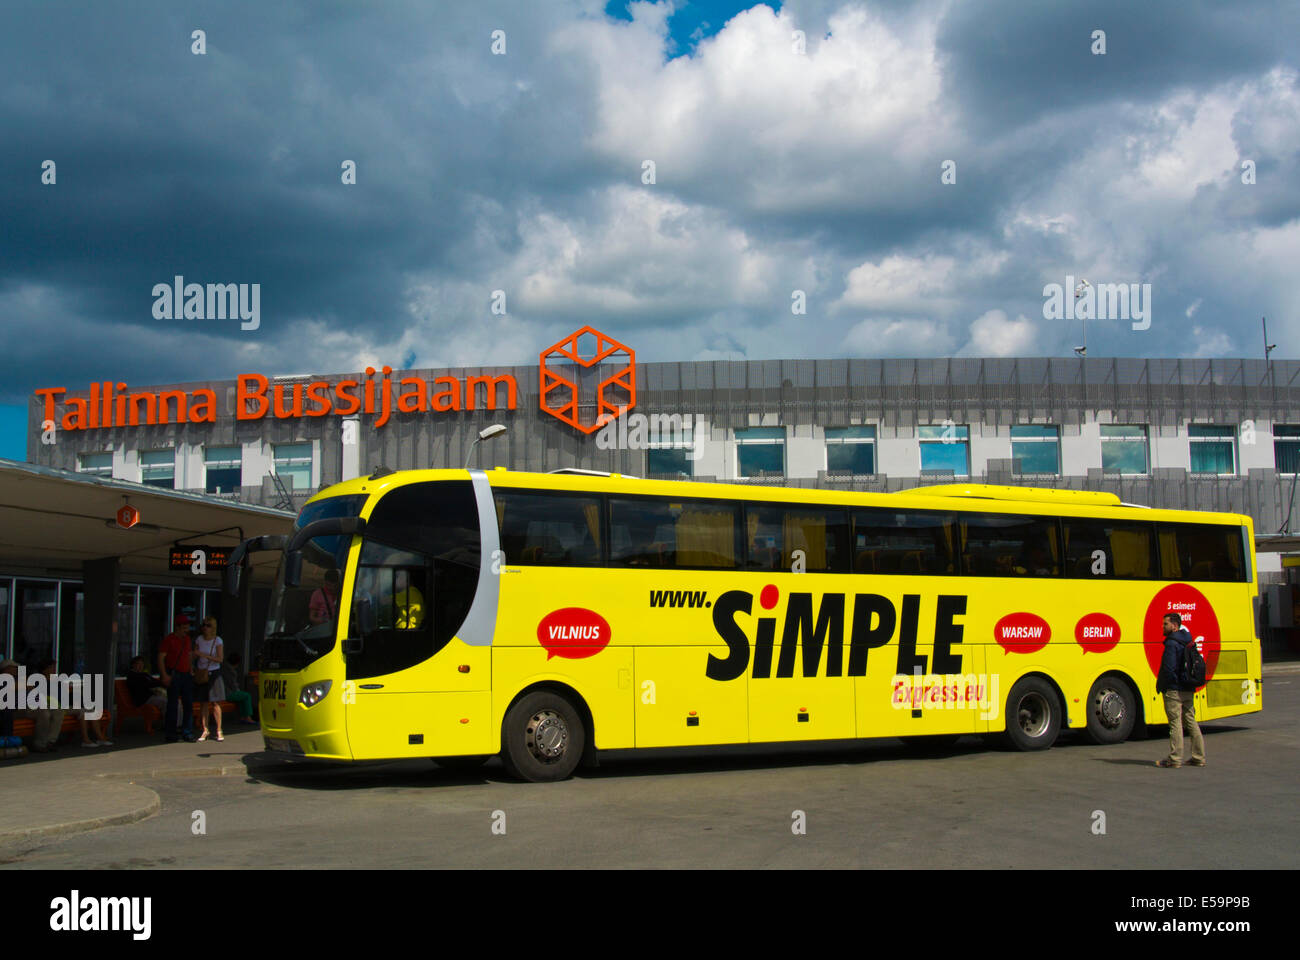 Simple Express Bus Long Distance Bus Station Tallinn Estonia